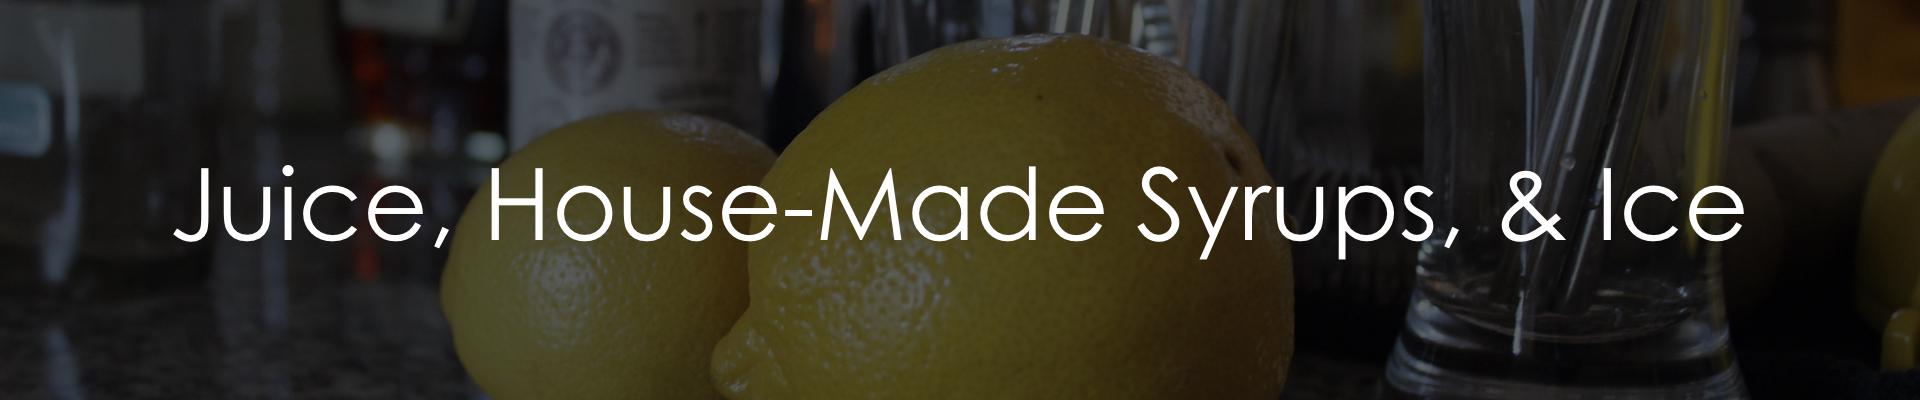 behind-the-wood-juice-syrup-ice-program